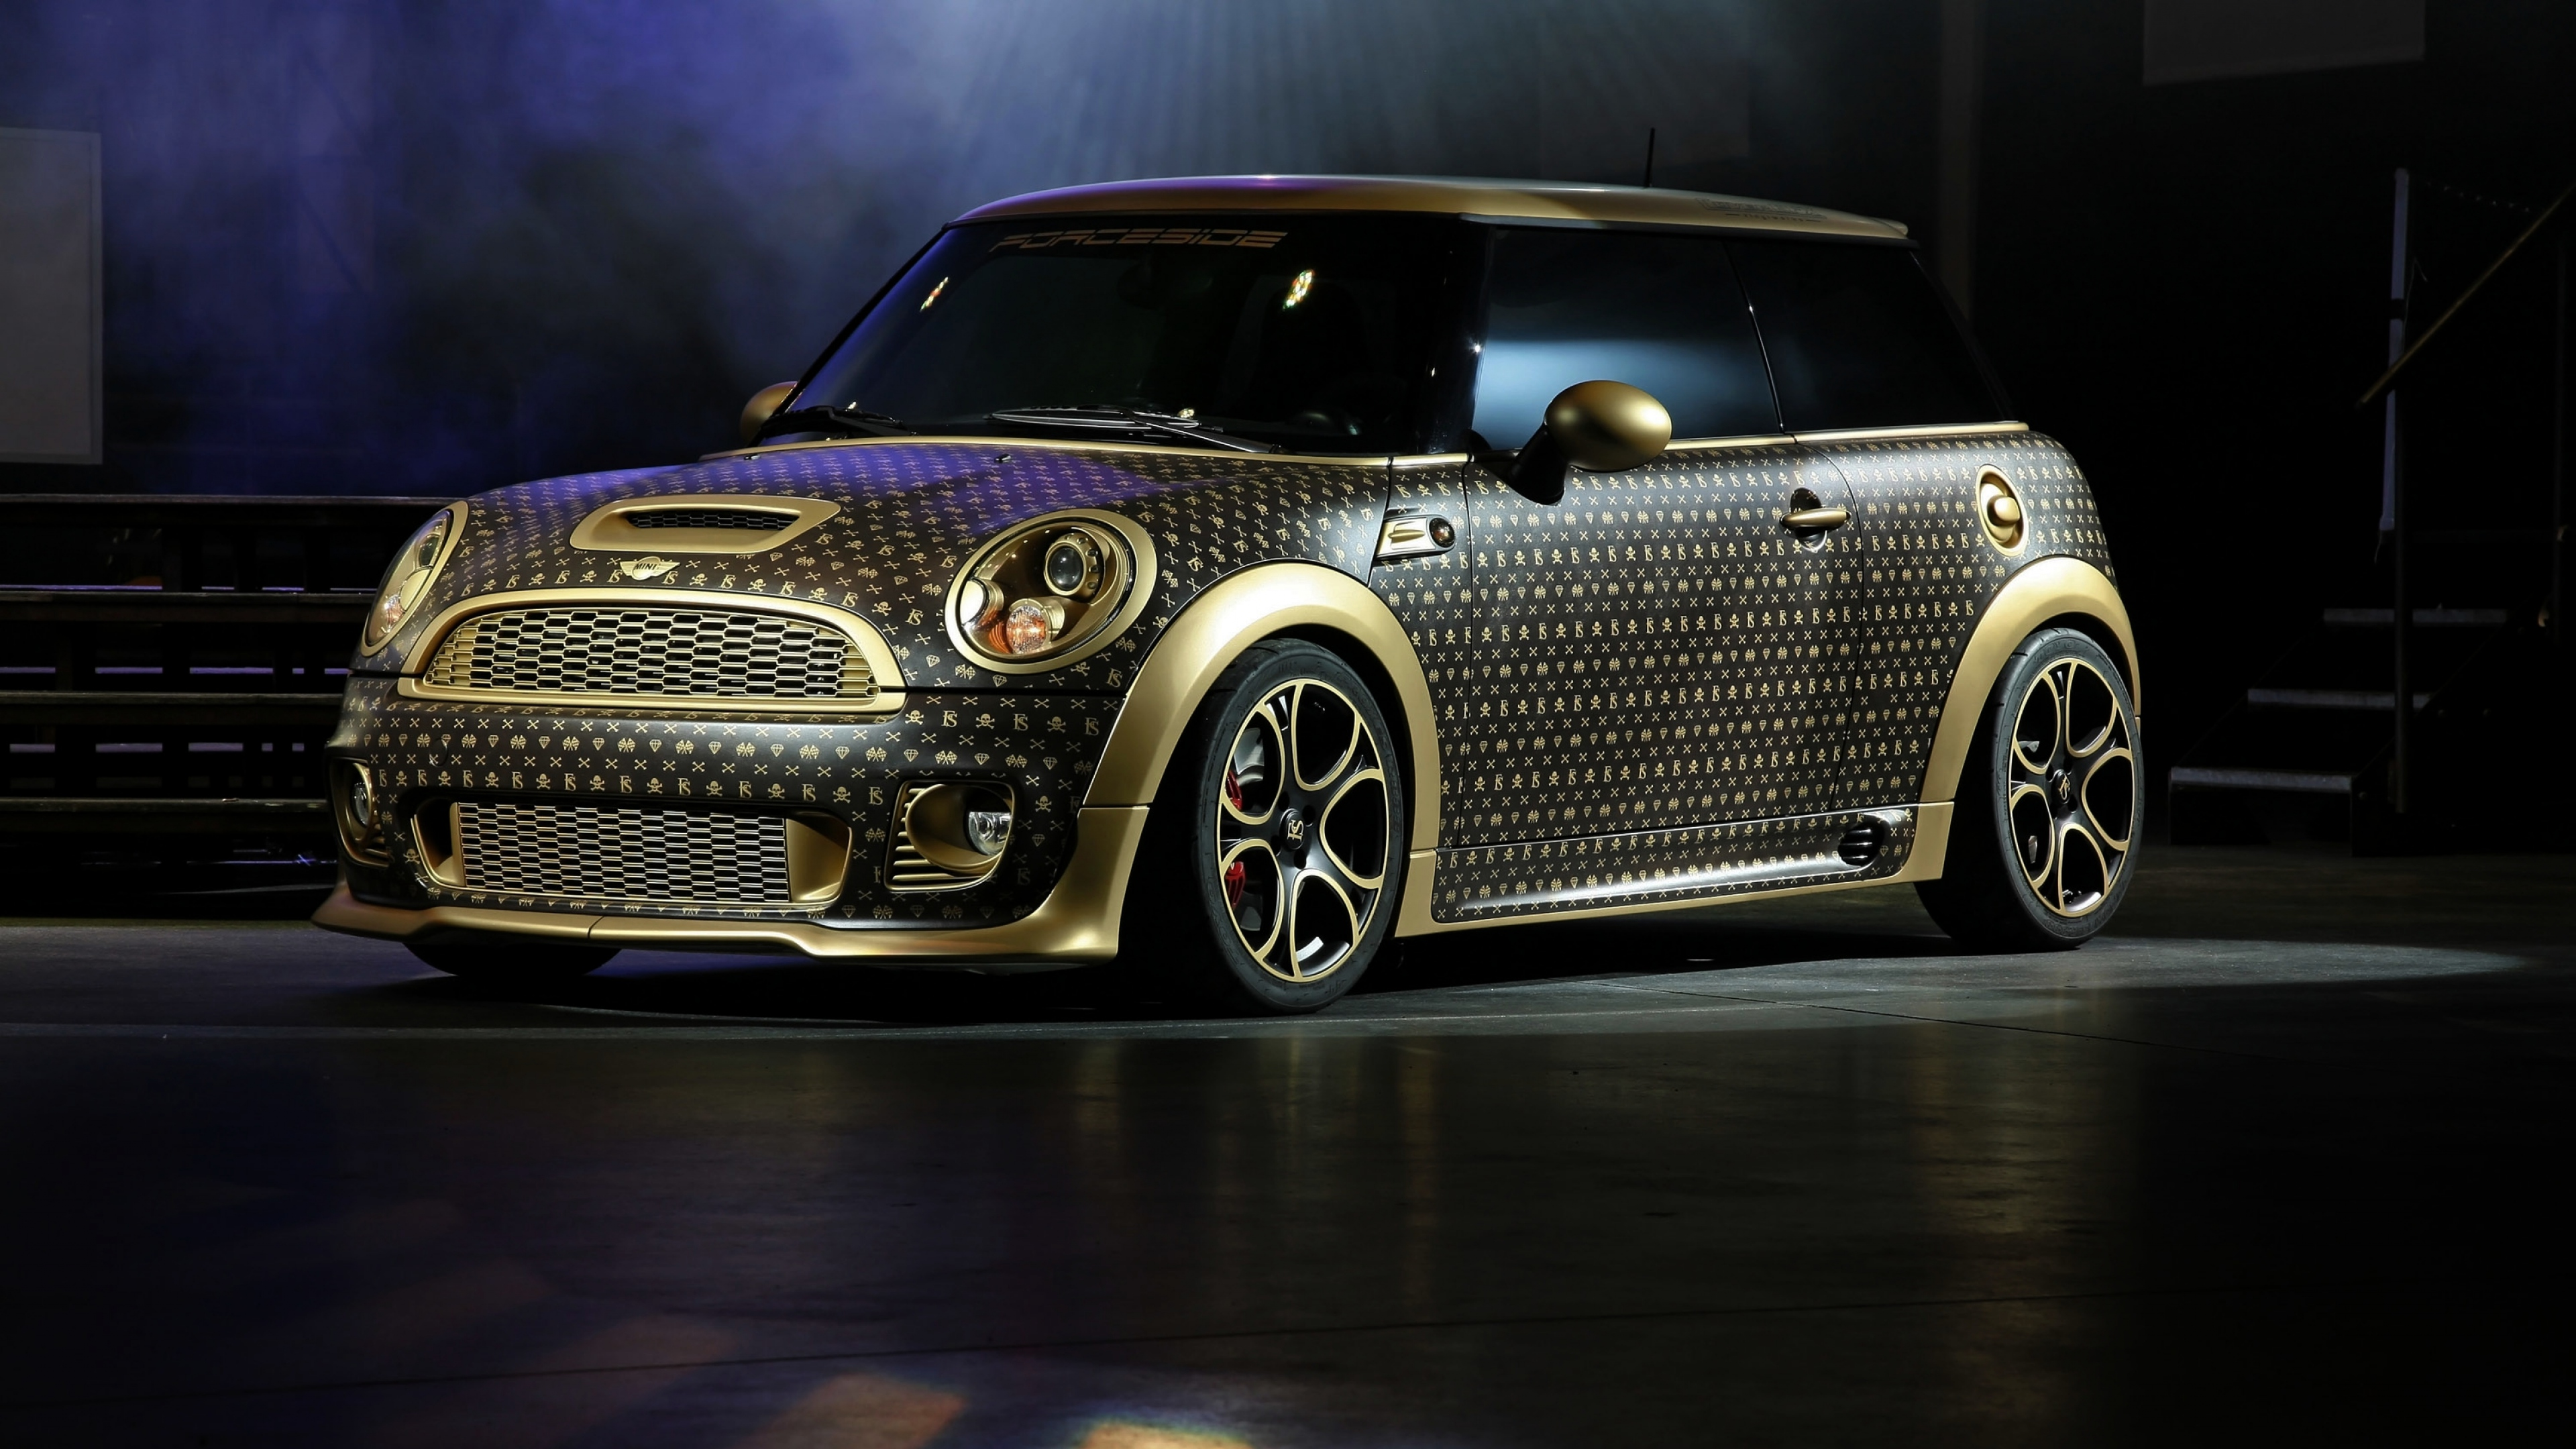 Mini cooper mini custom hd cars 4k wallpapers images backgrounds mini cooper mini custom voltagebd Images